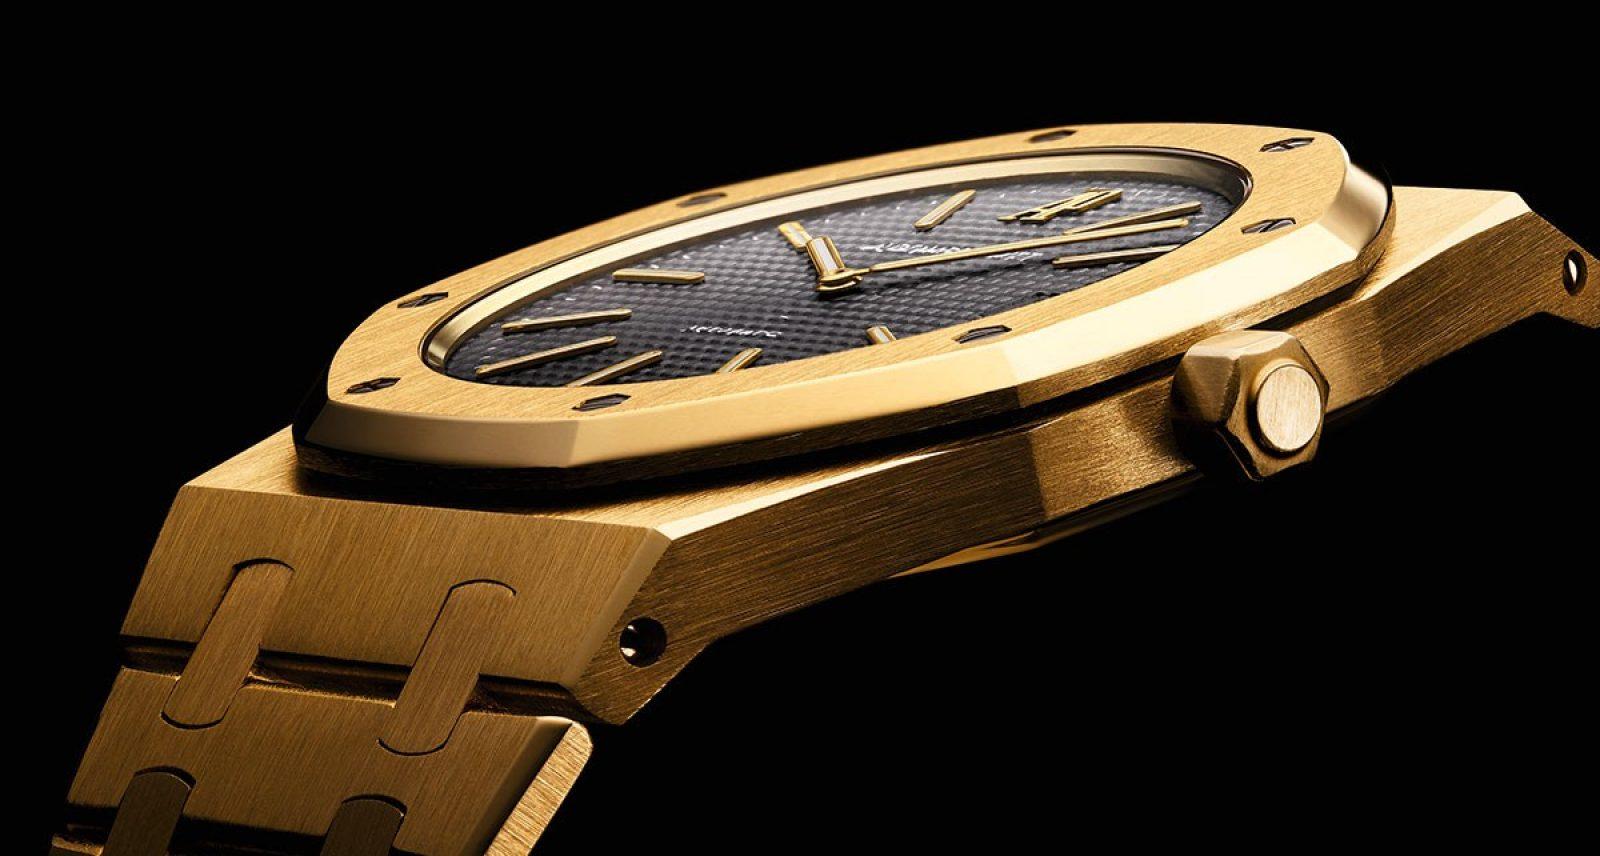 Justin Bieber Bought Himself This Inordinately Luxurious Audemars Piguet Watch as a Wedding Present